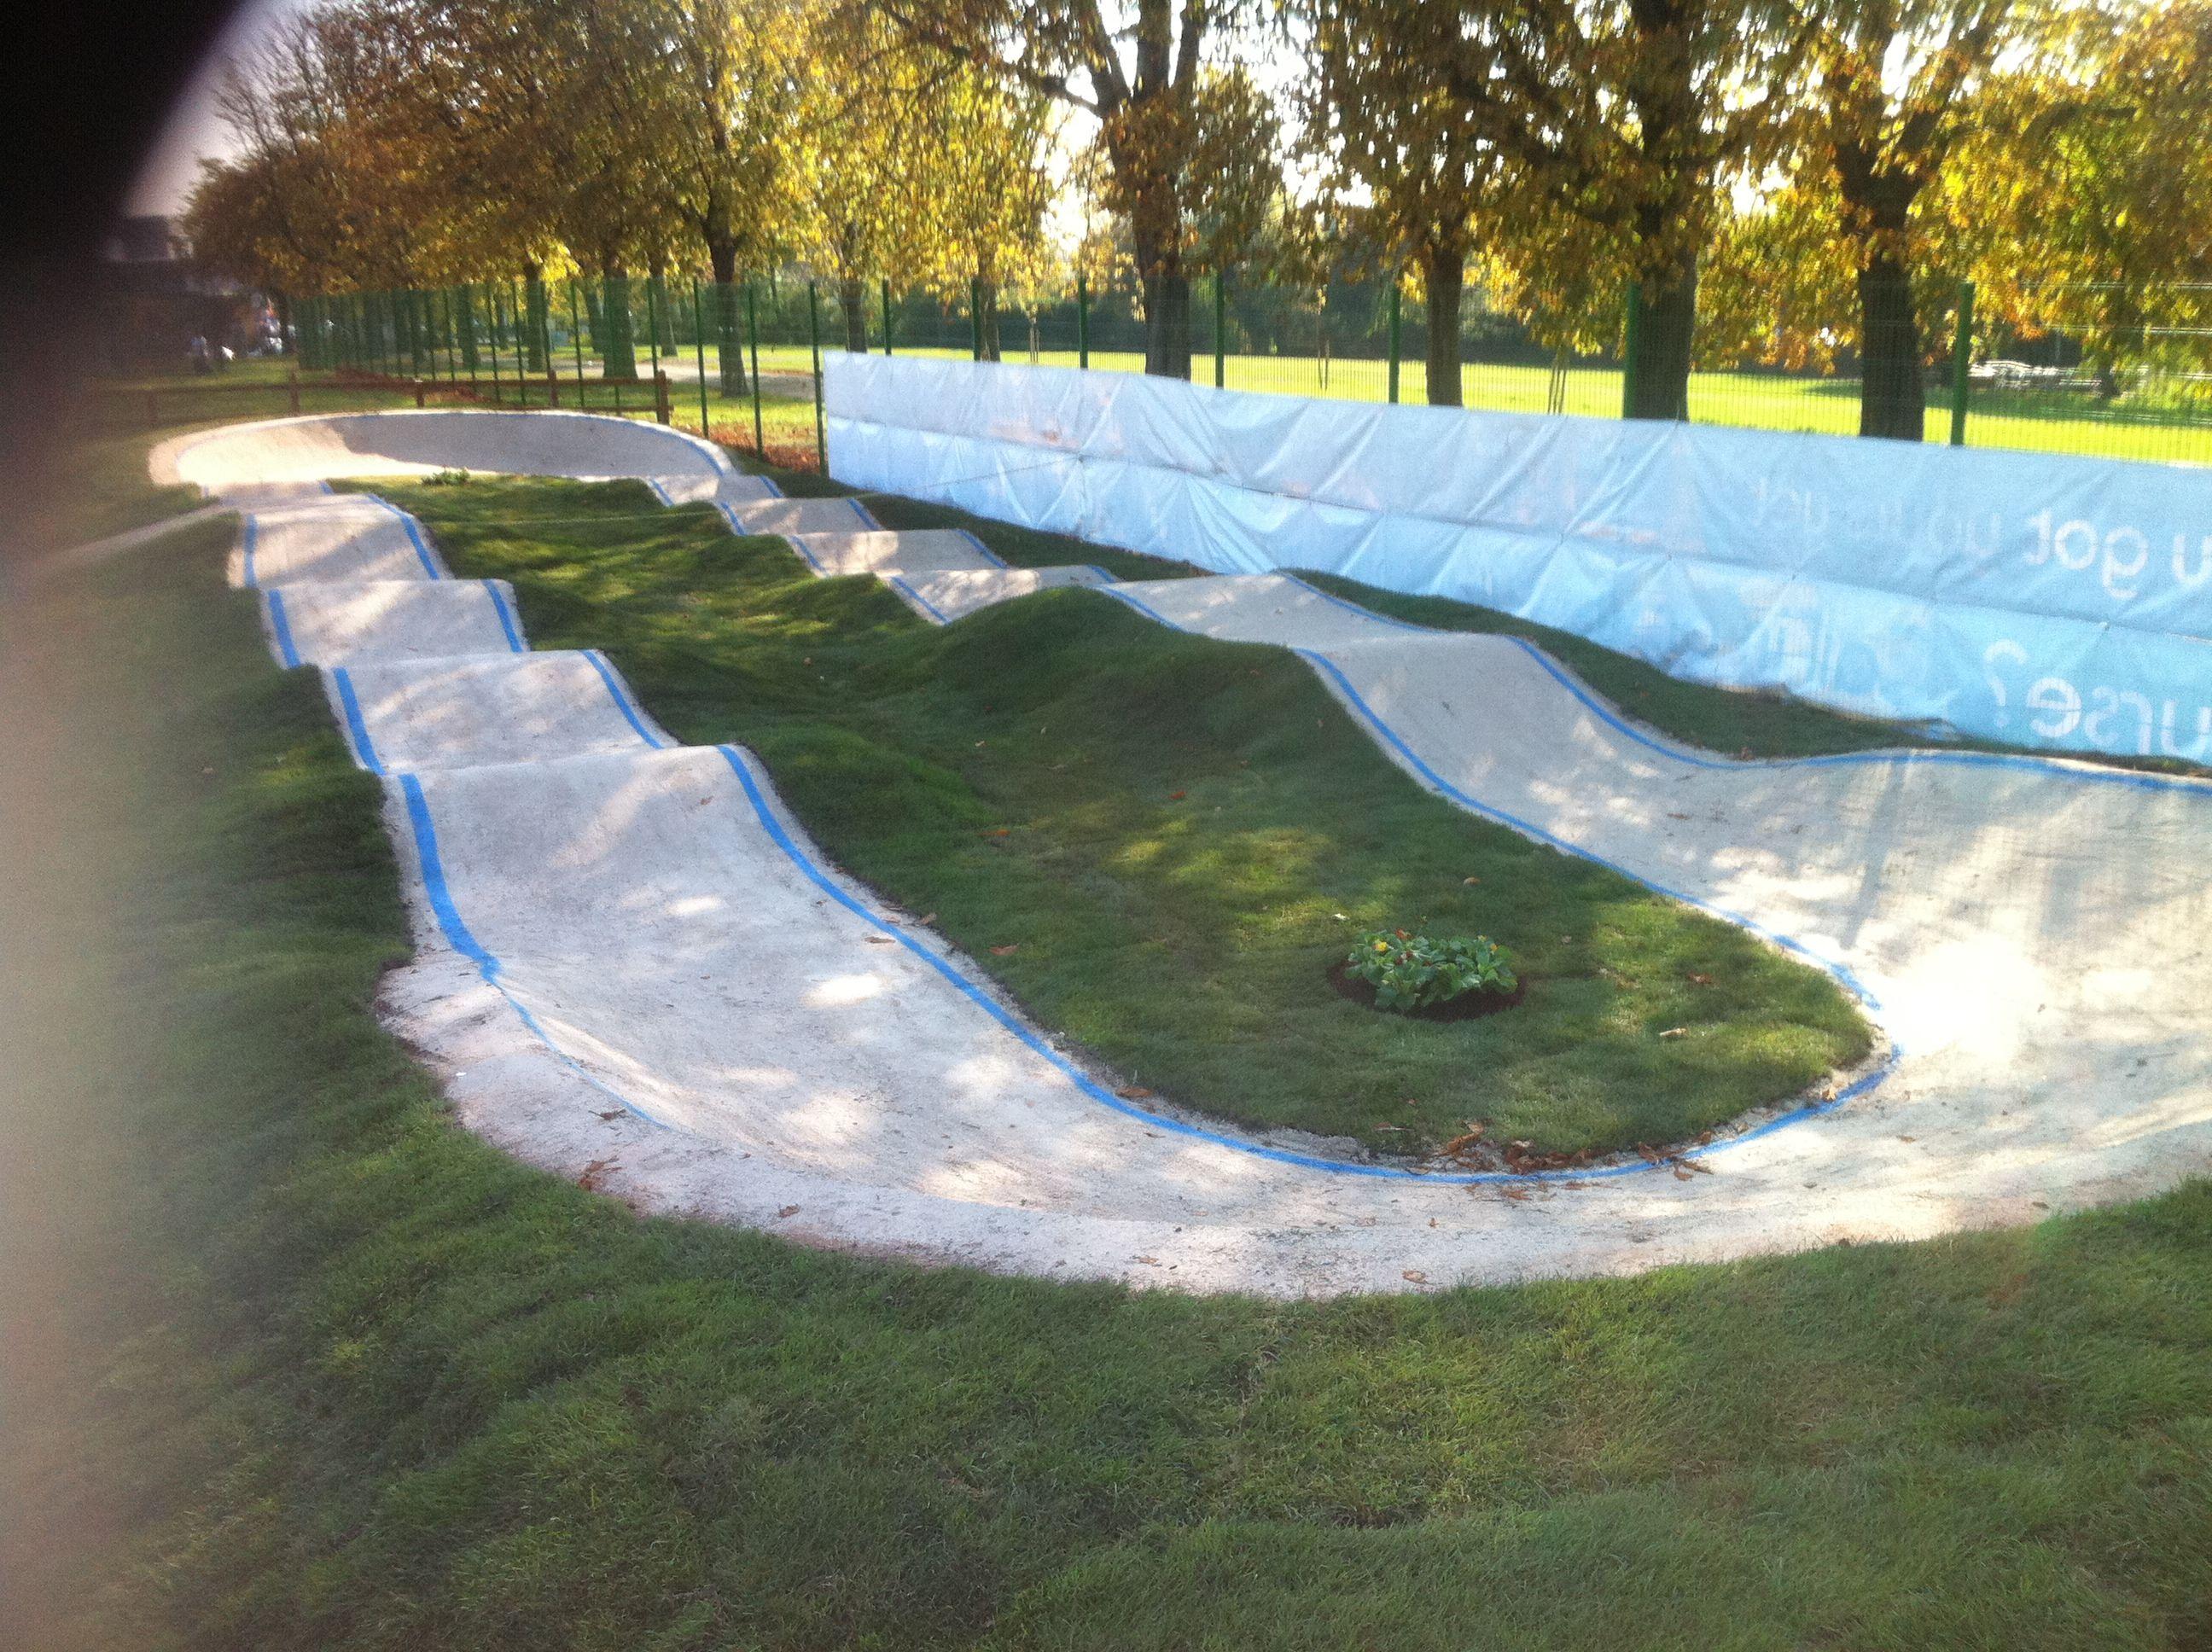 Anyone Have A Small Pump Track Bike Pump Track Backyard Skatepark Backyard Mini backyard motocross track